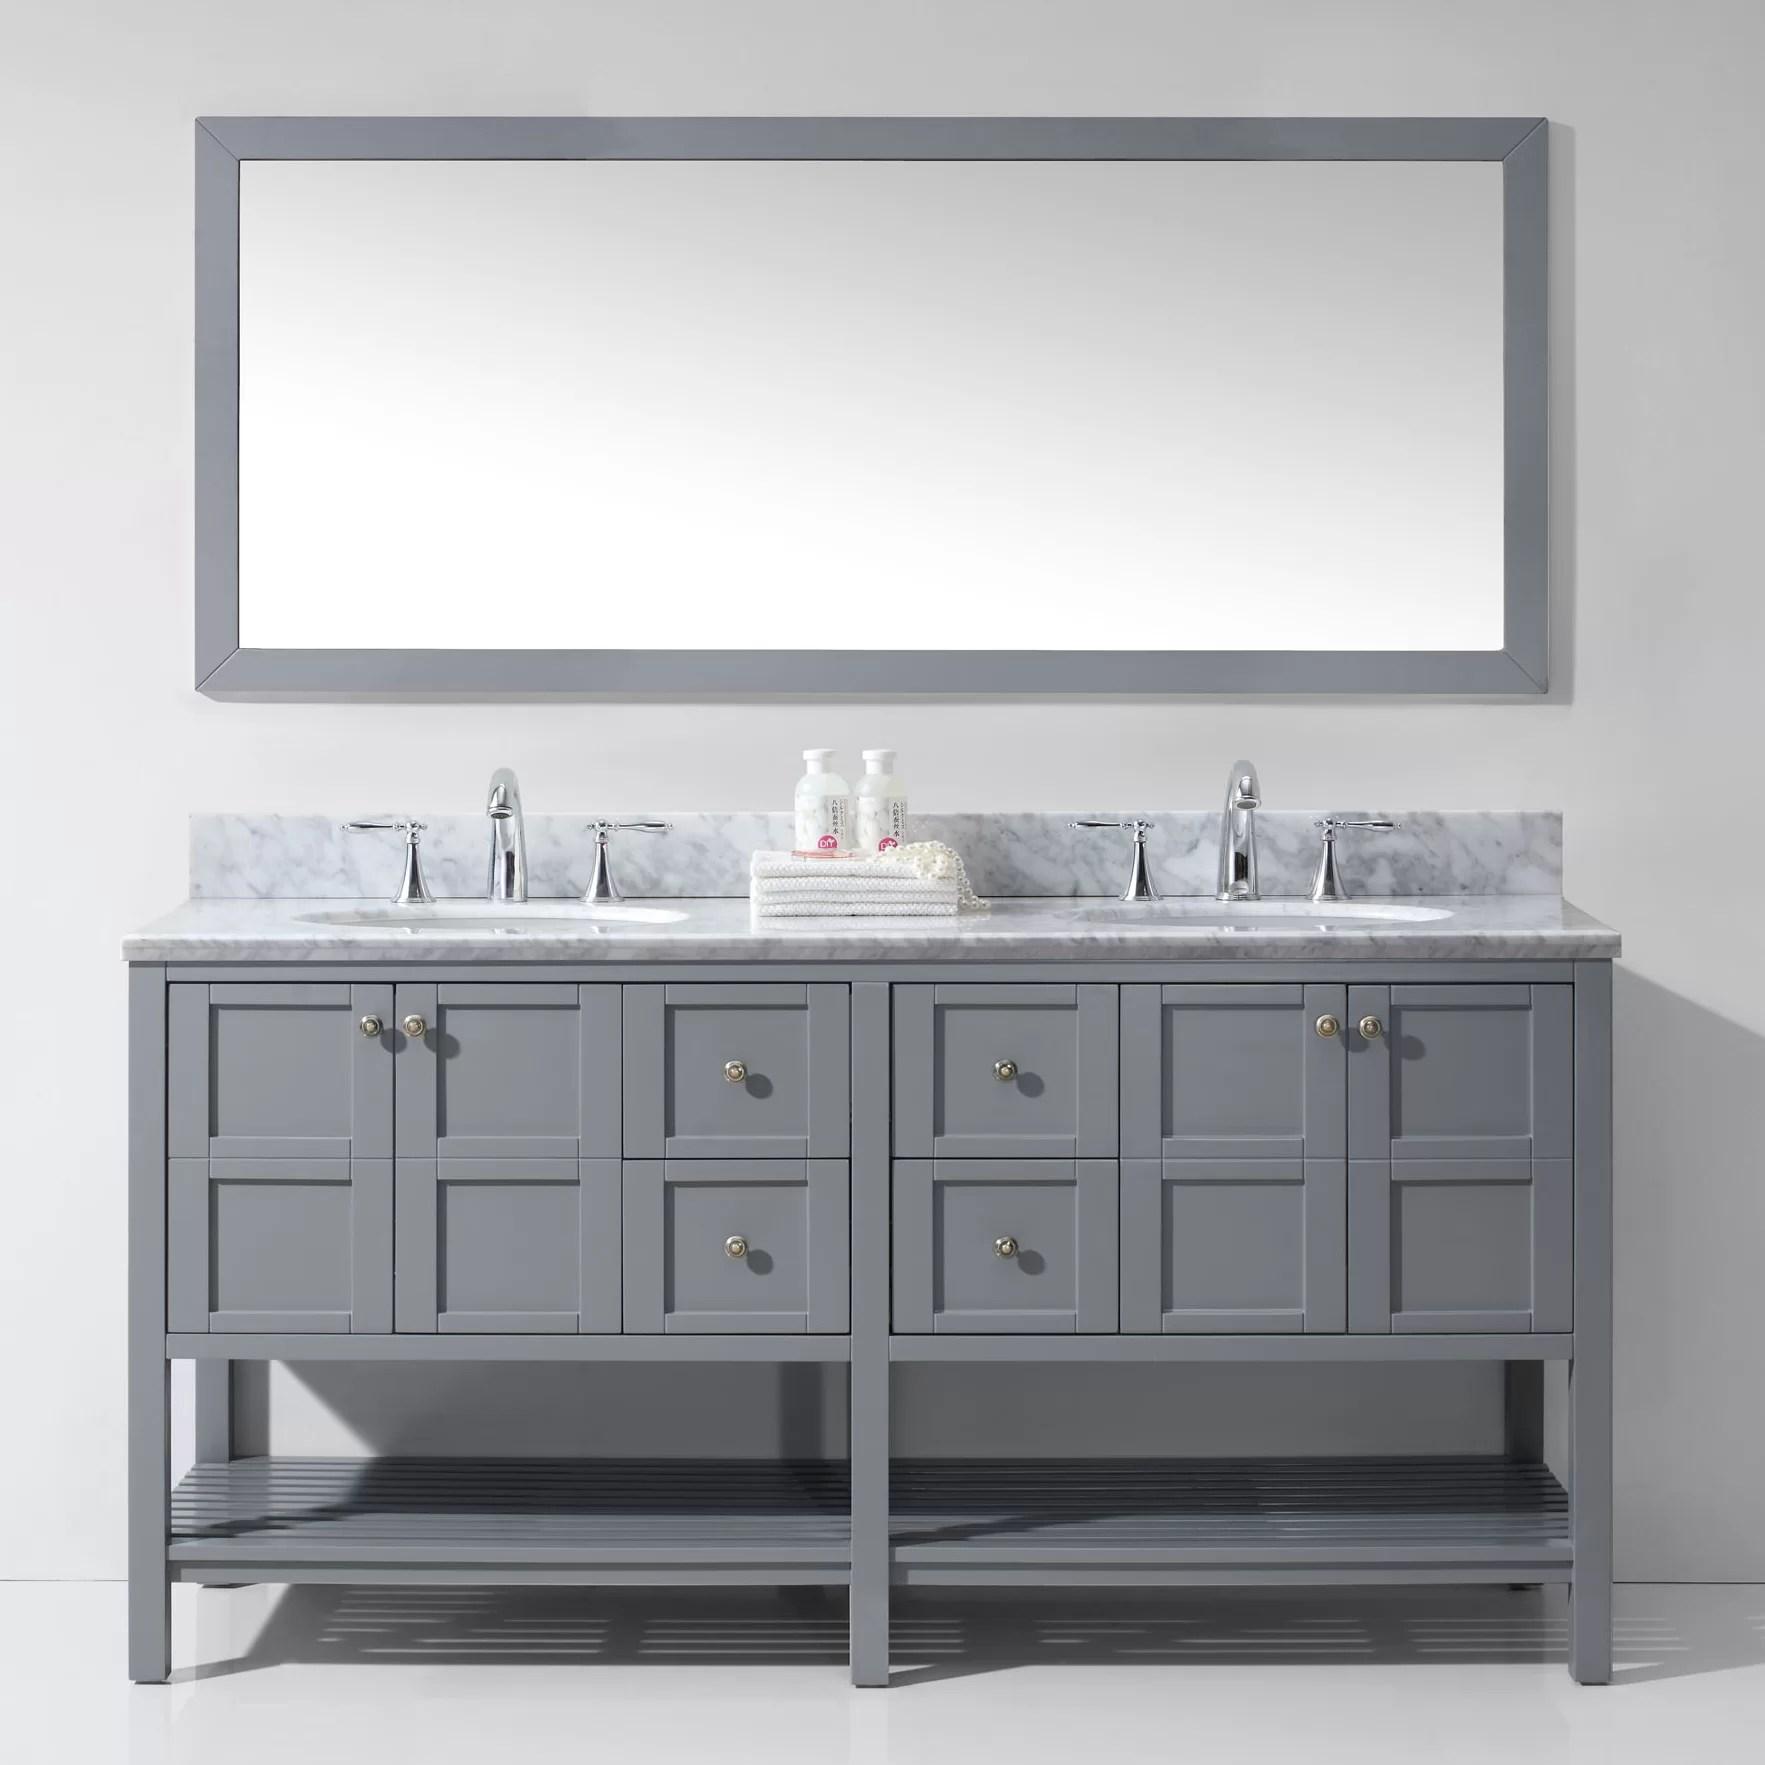 Virtu Winterfell 709 Double Bathroom Vanity Set with